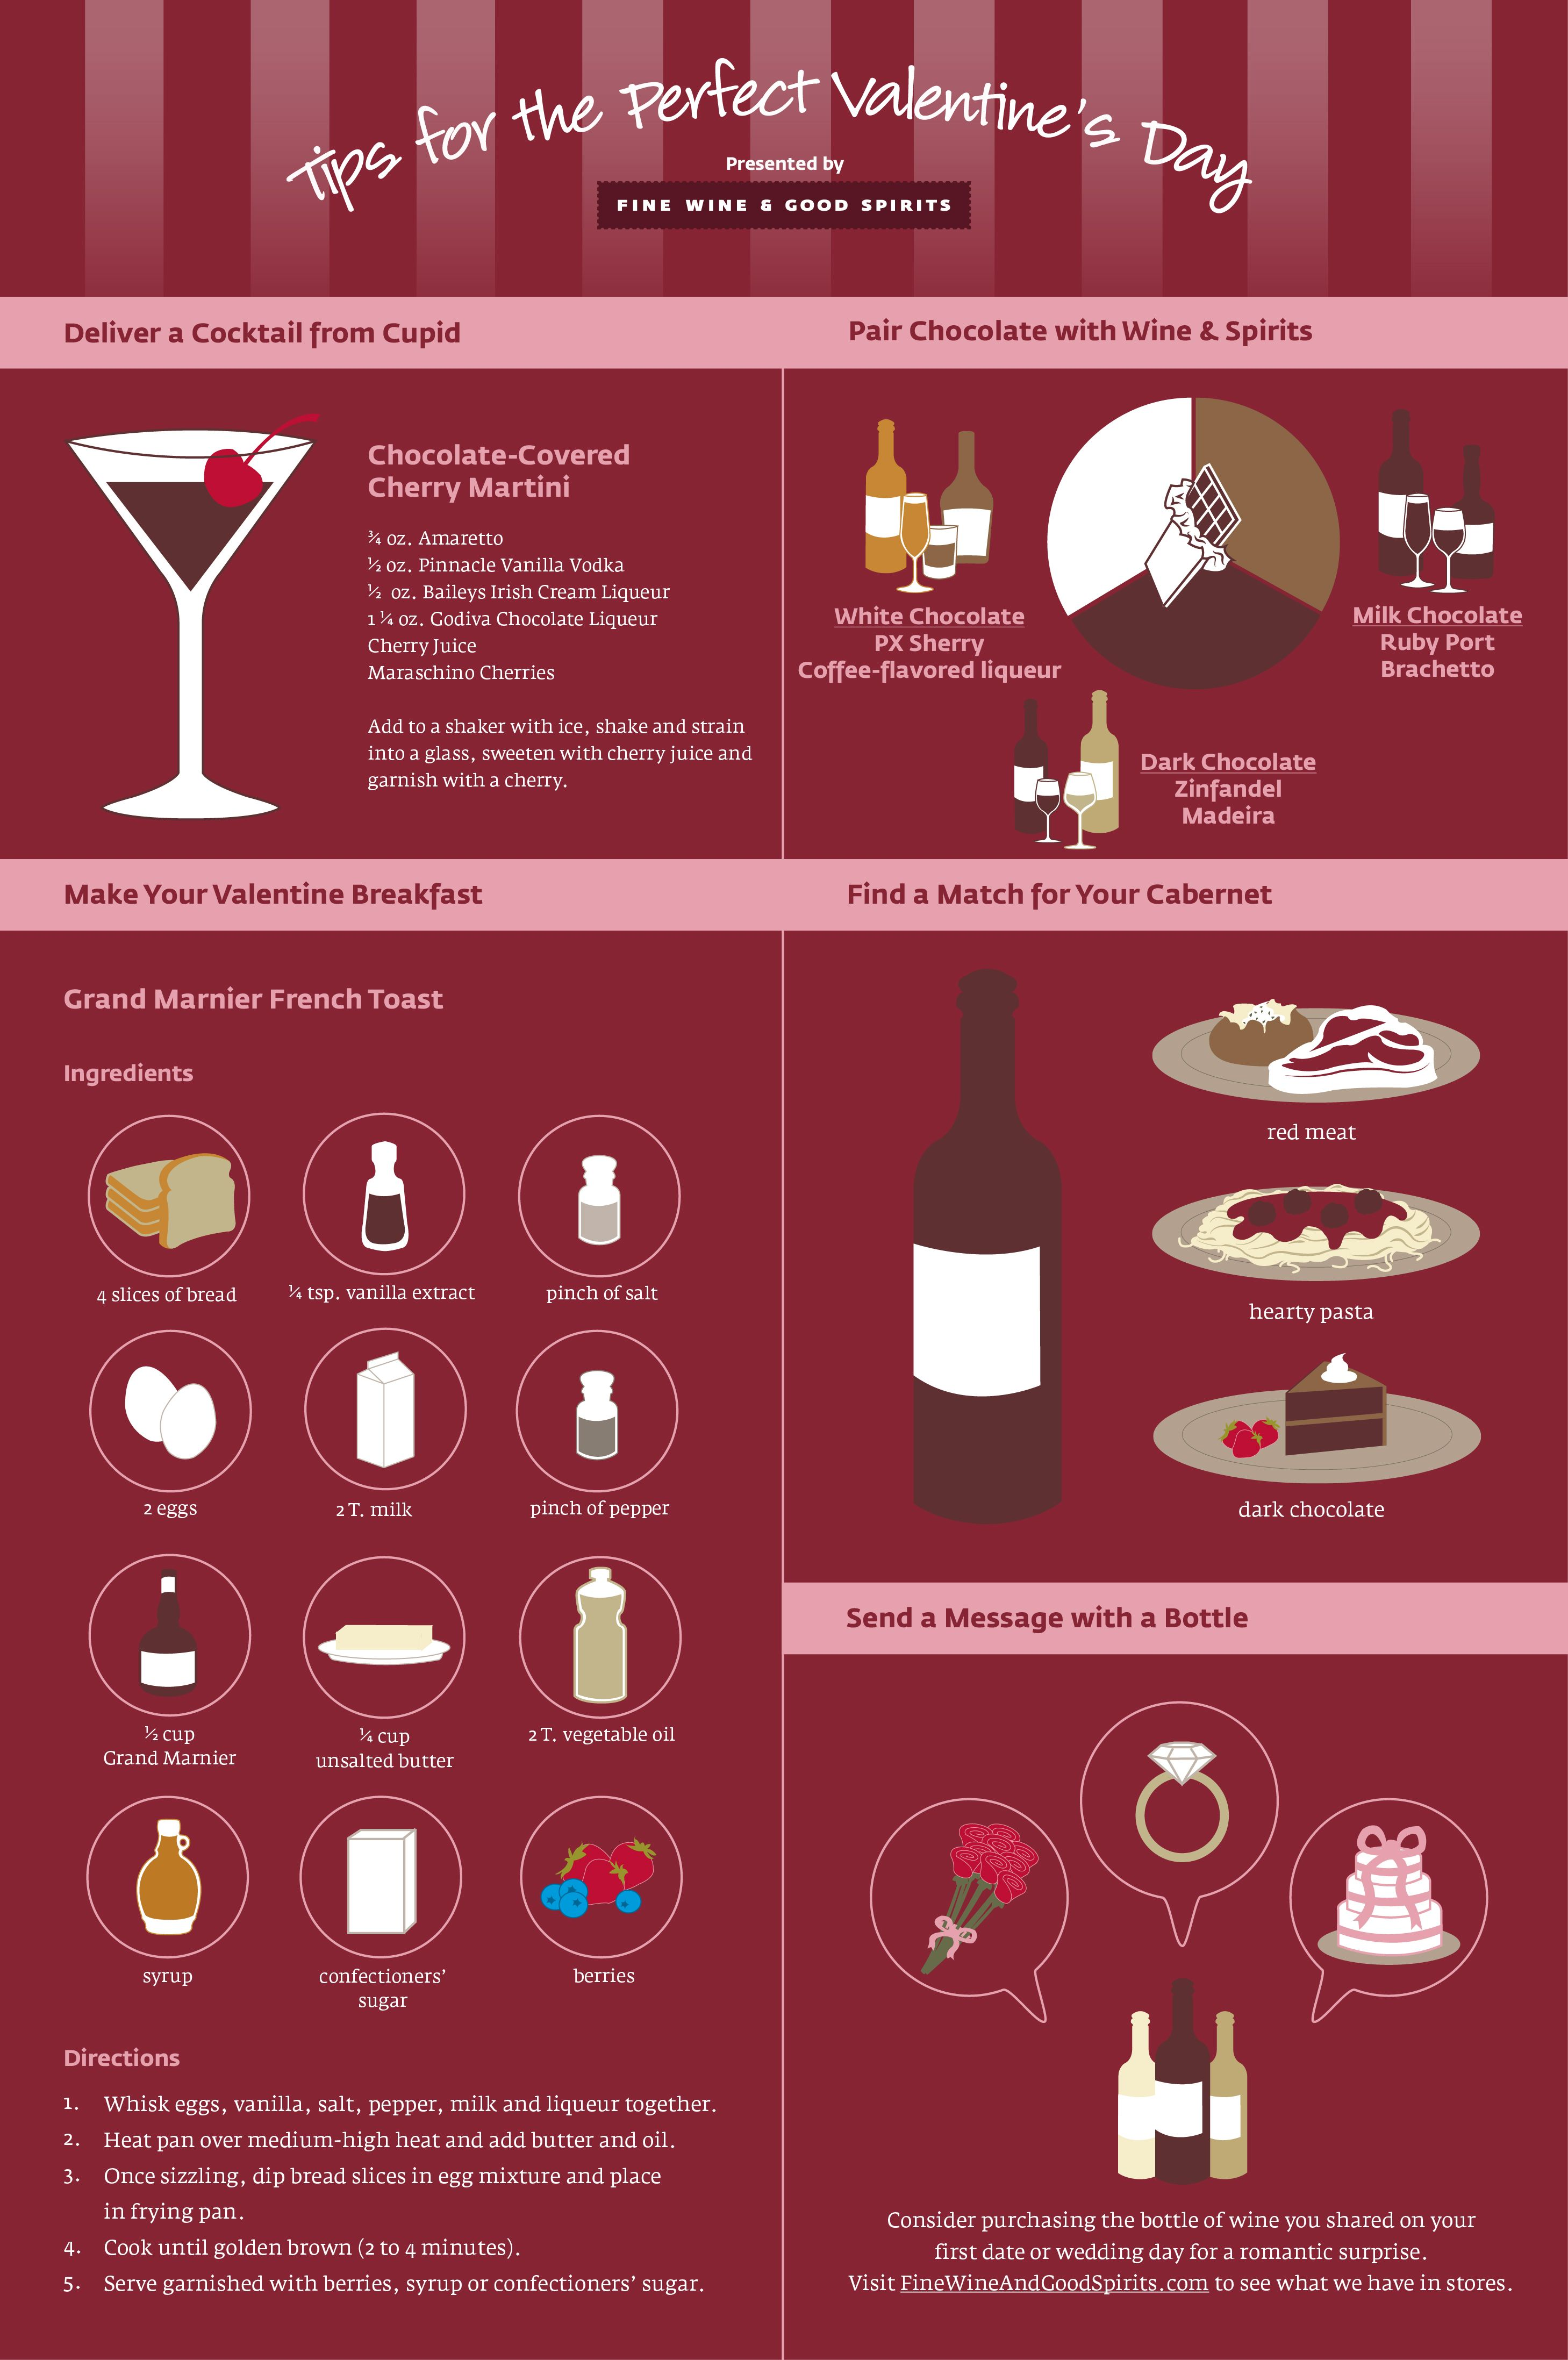 Pin By Fine Wine Good Spirits On Valentine S Day Cocktails Vanilla Vodka Wine And Spirits Cherry Martini